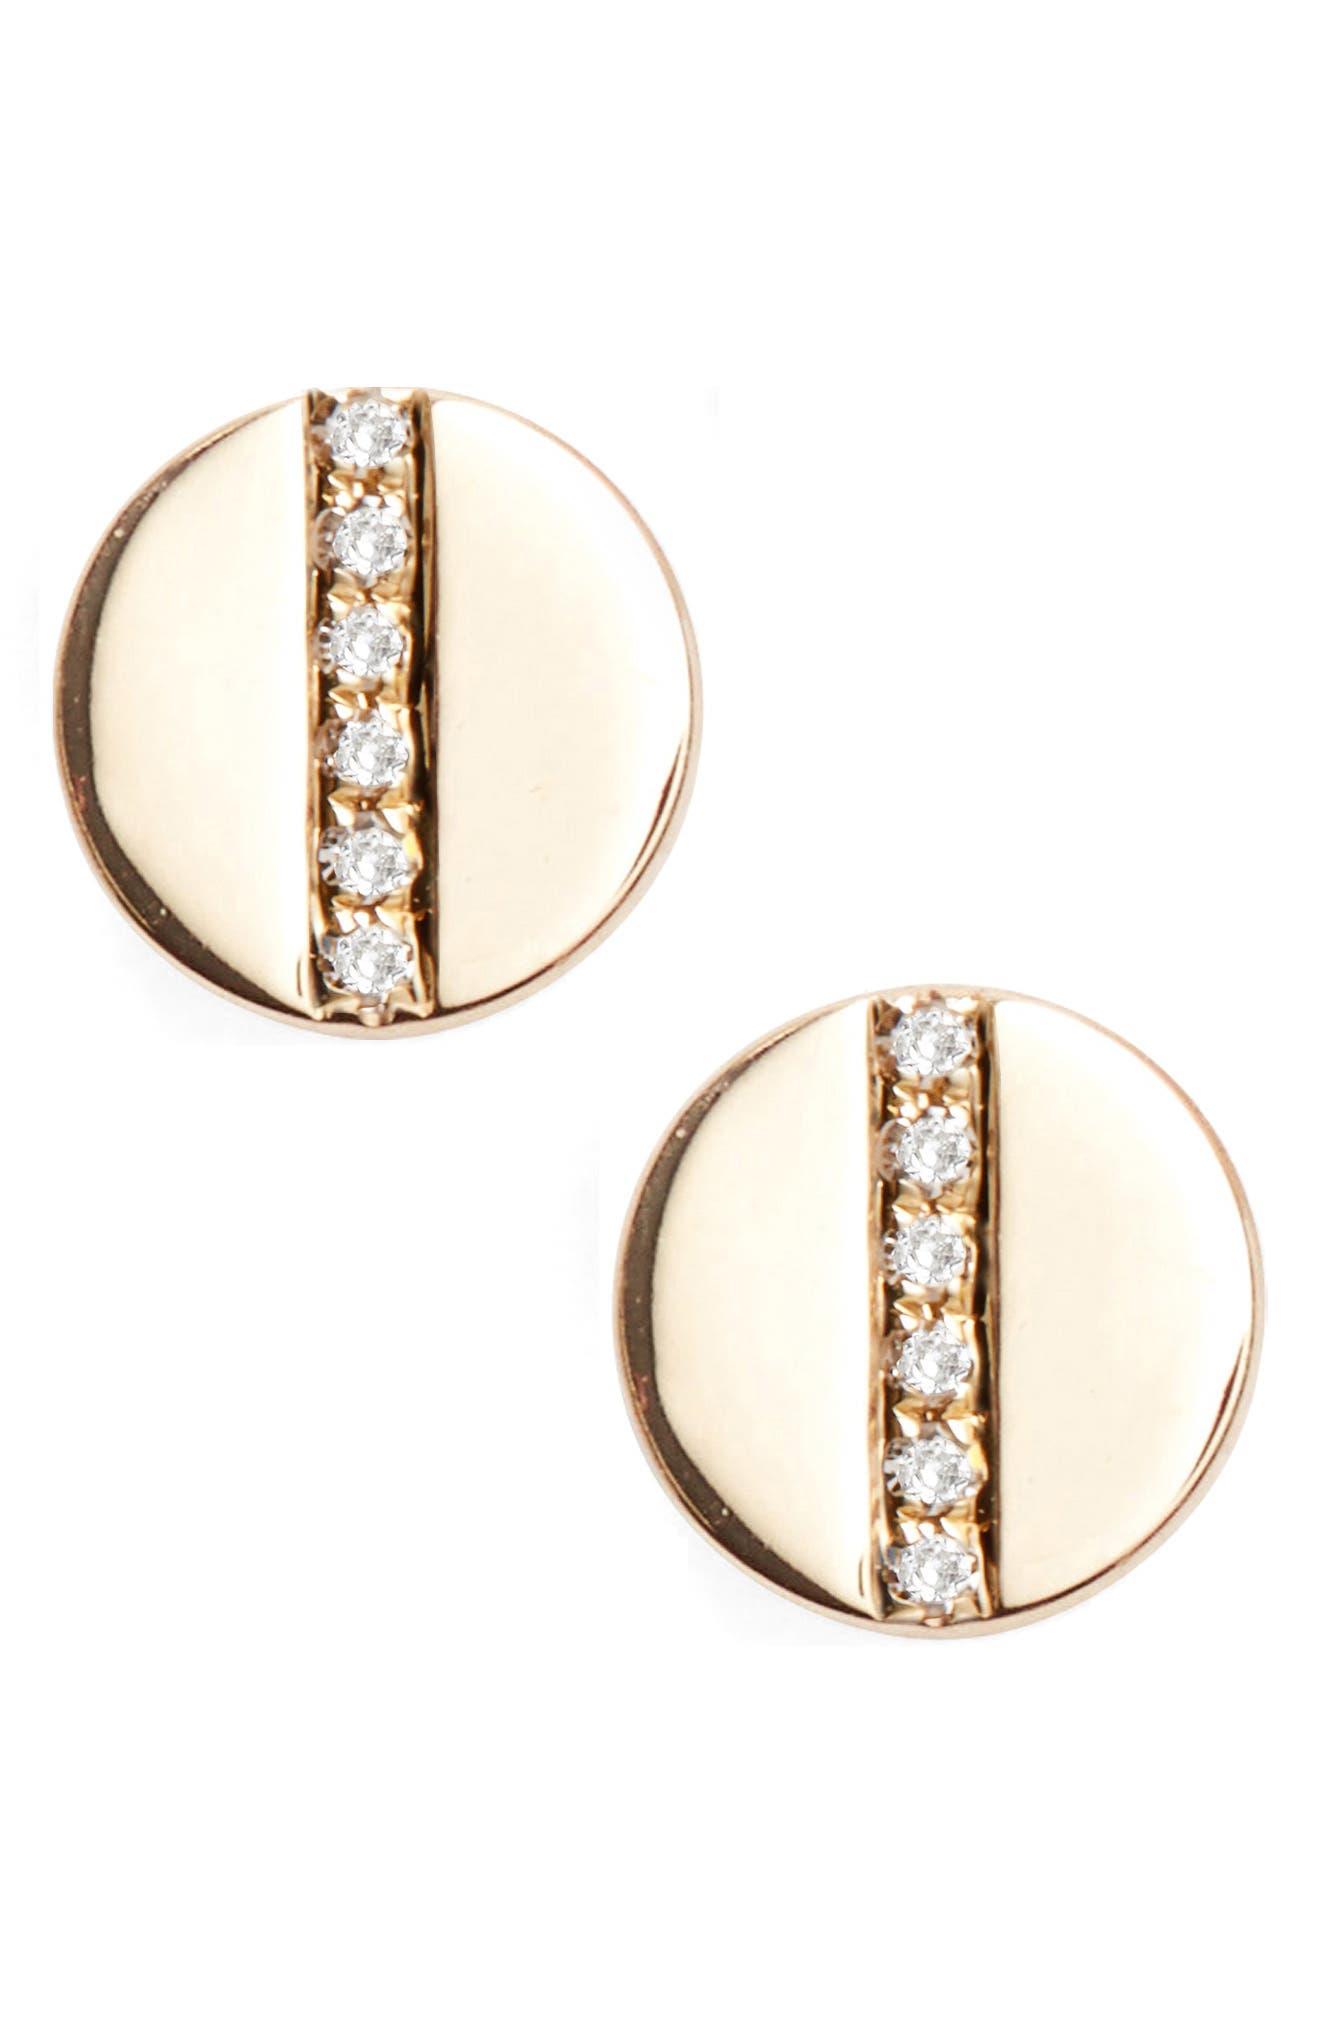 Screw Diamond Stud Earrings,                             Main thumbnail 1, color,                             YELLOW GOLD